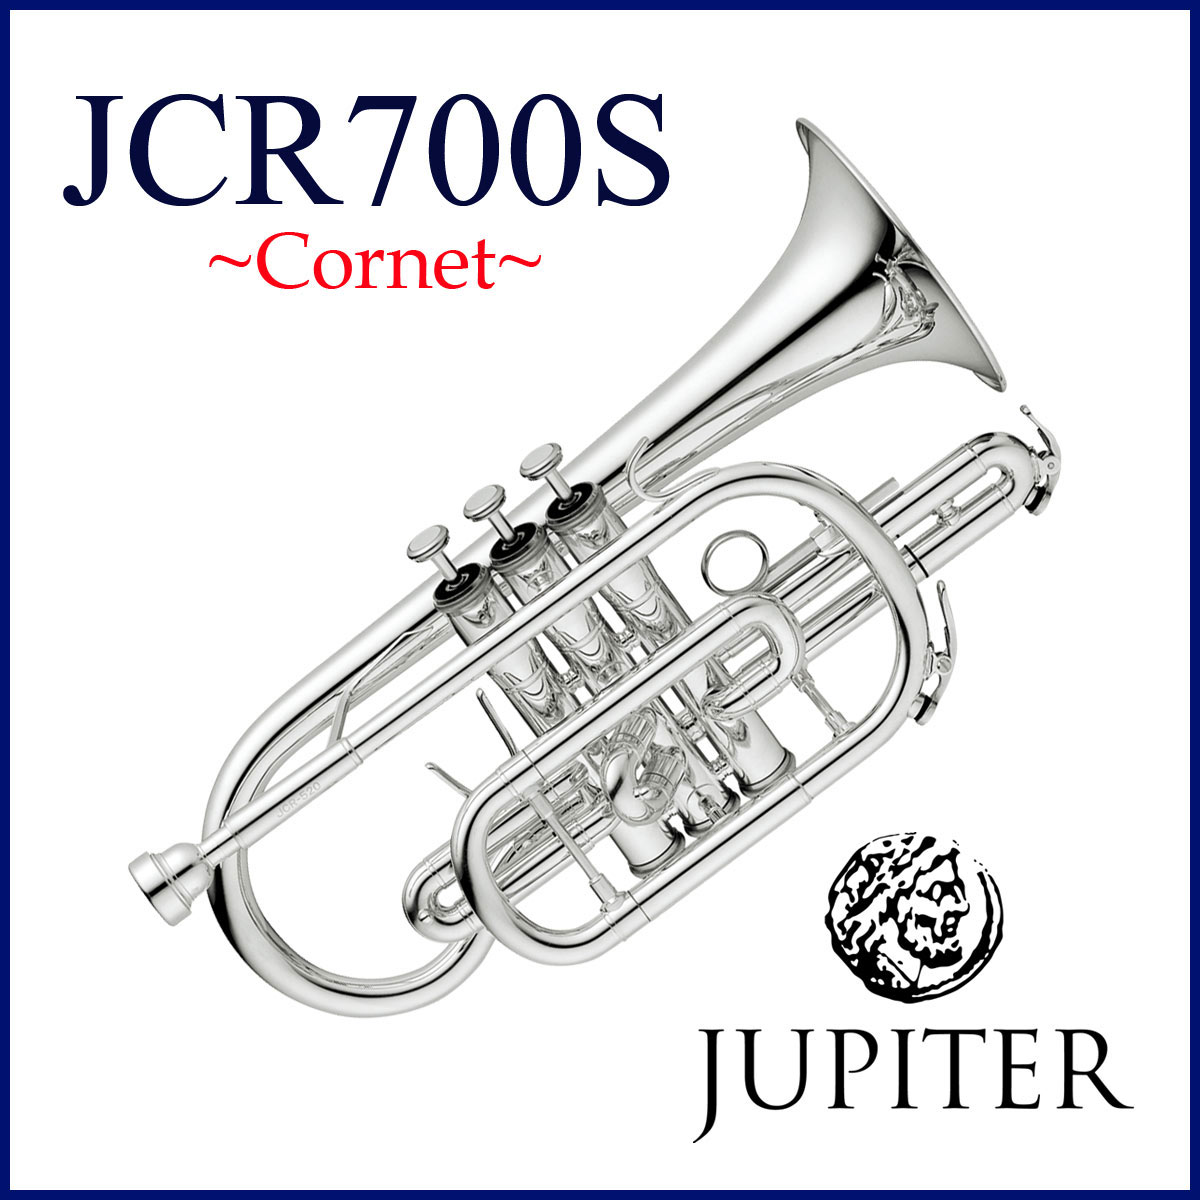 JUPITER / JCR-700S ジュピター コルネット シルバーメッキ仕上げ《お取り寄せ》